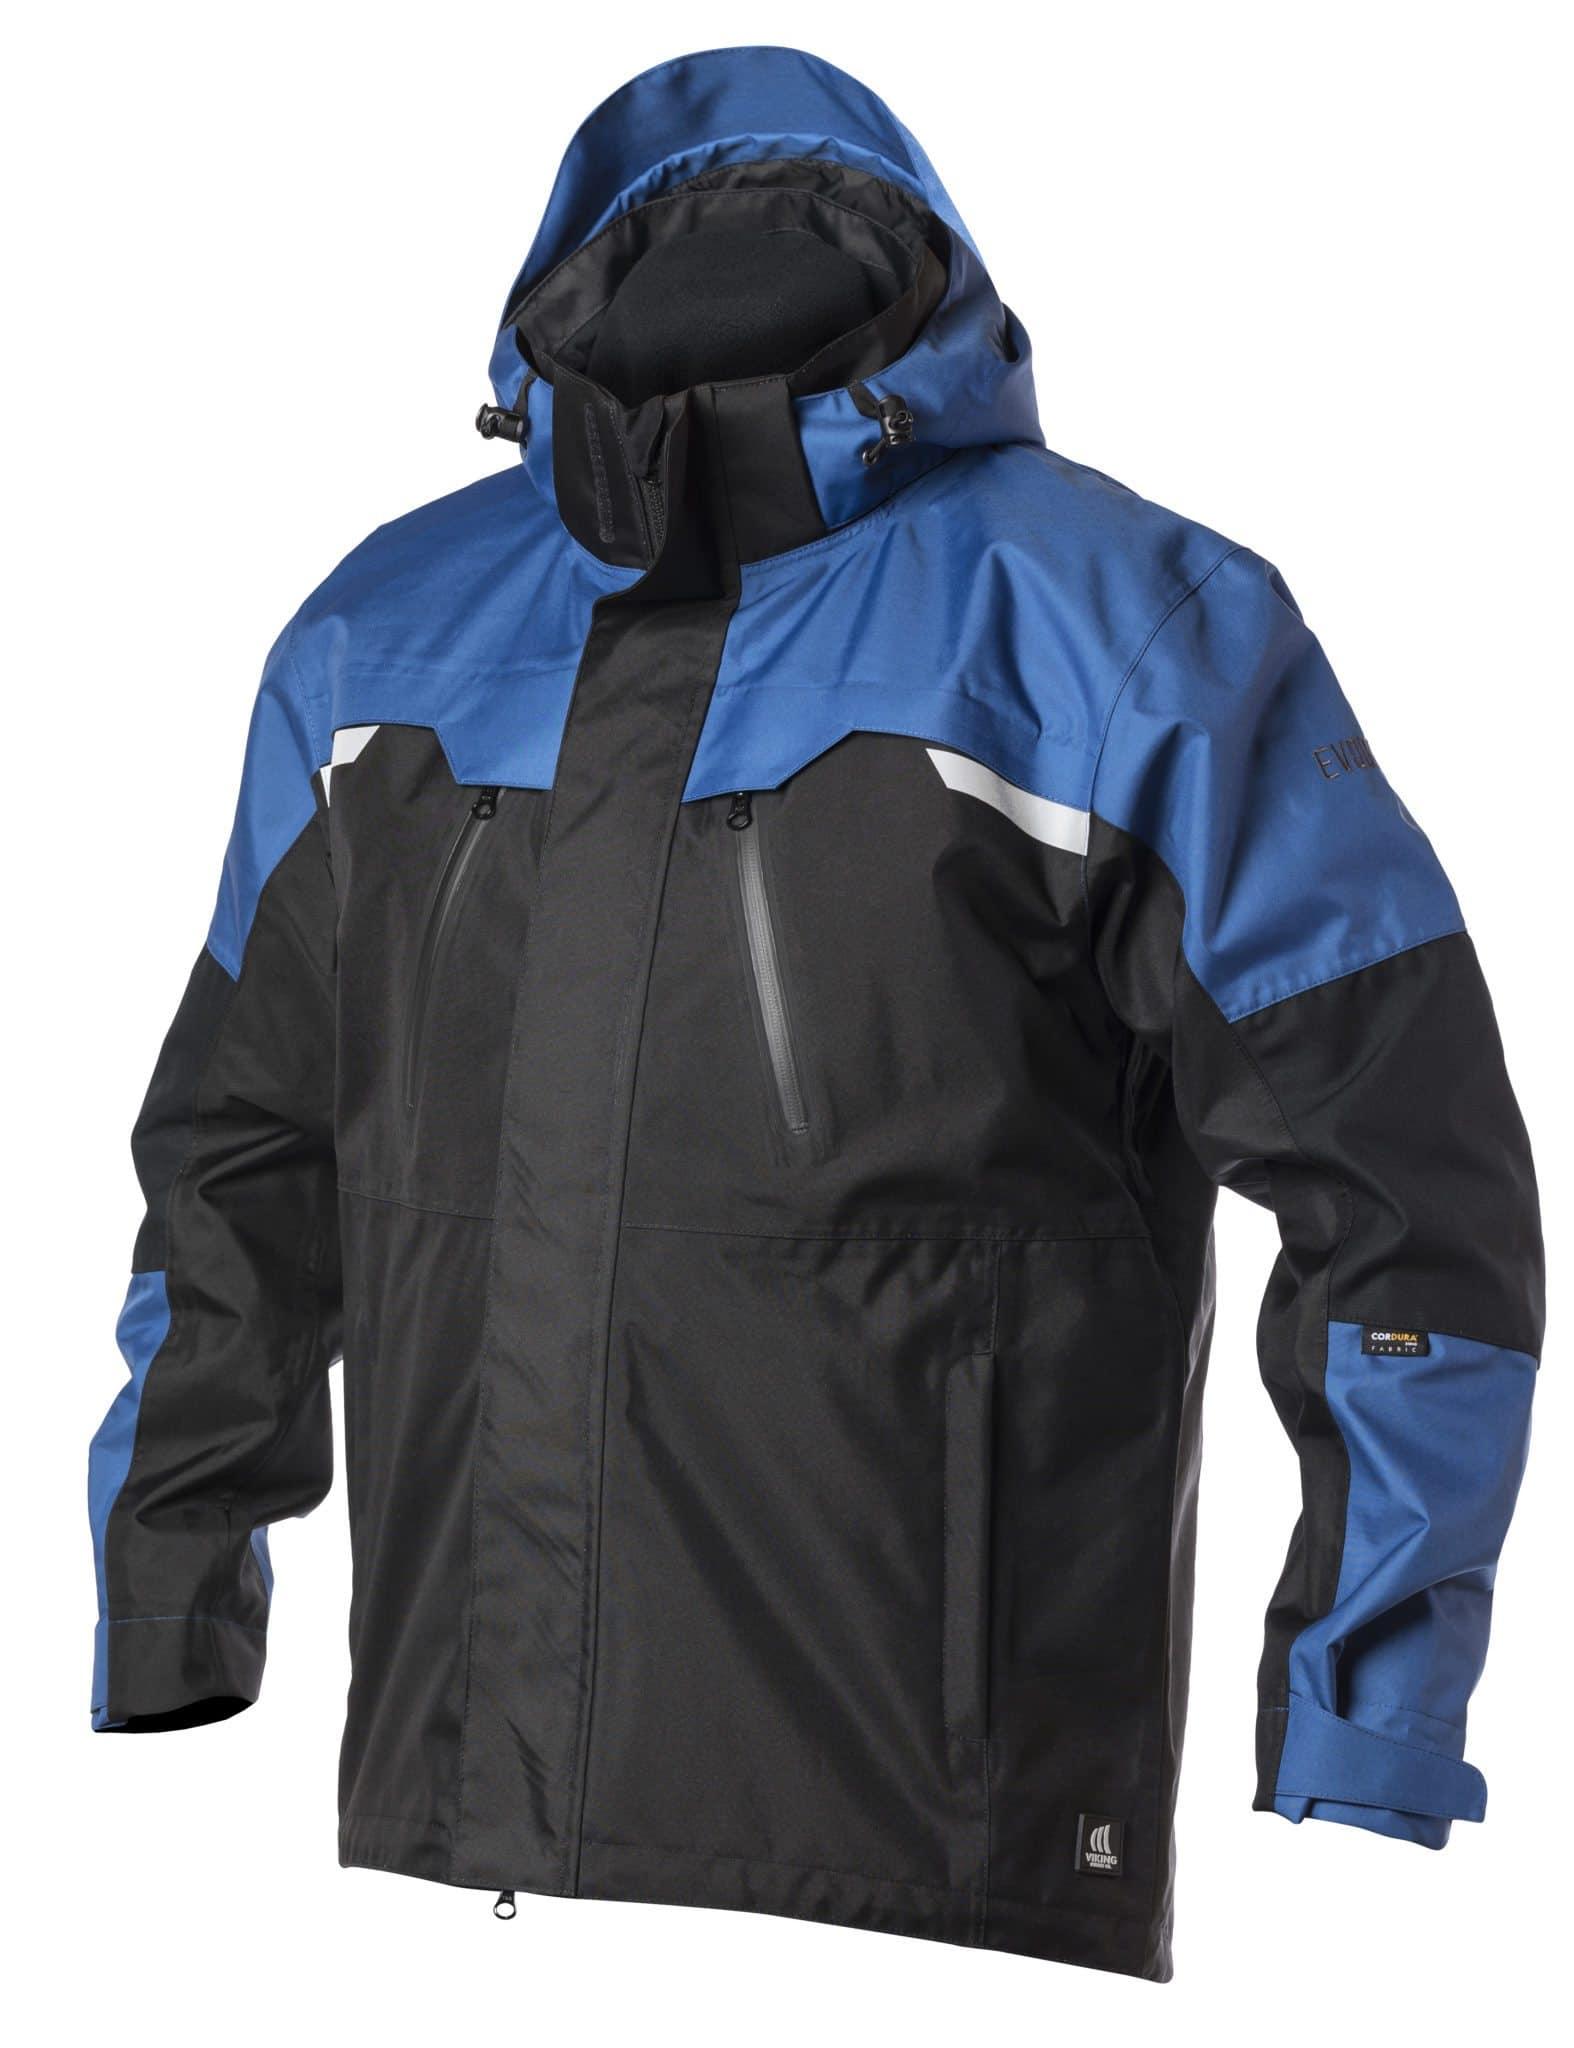 All Weather jacket EVOBASE